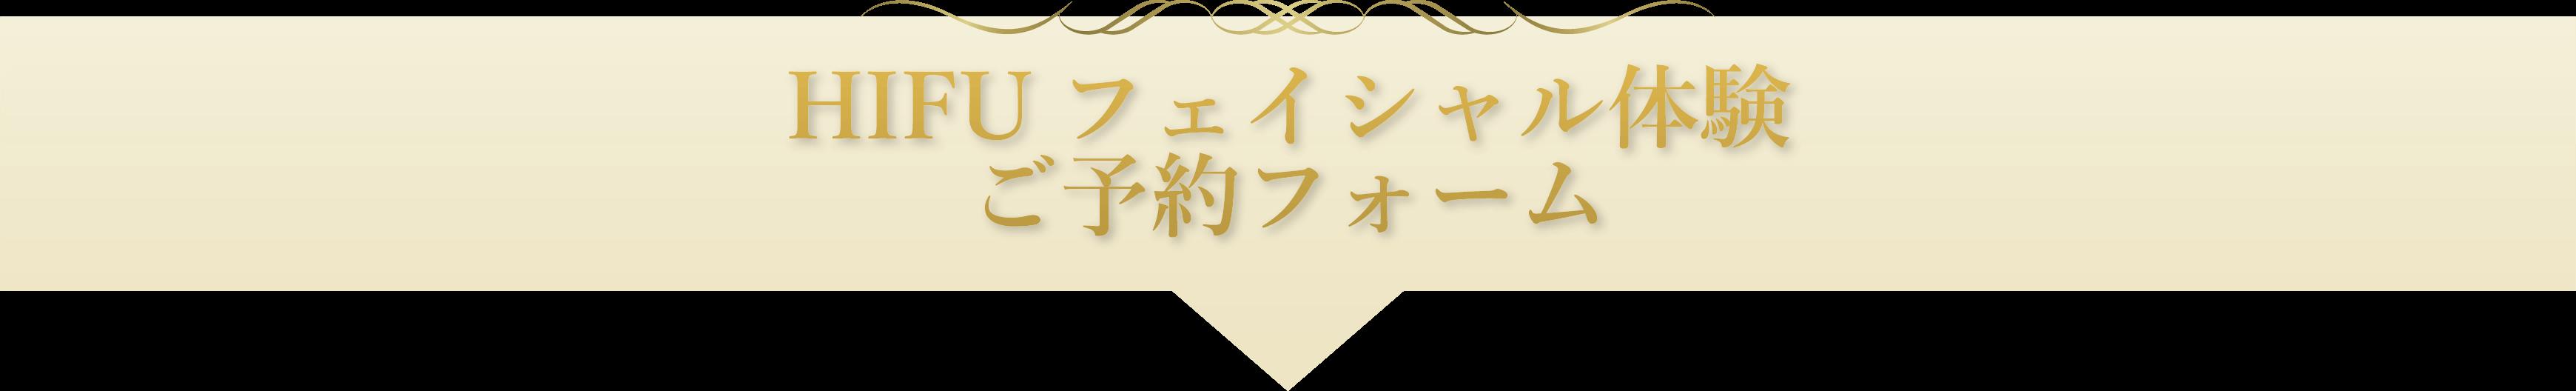 HIFU(ハイフ)フェイシャル体験ご予約フォーム